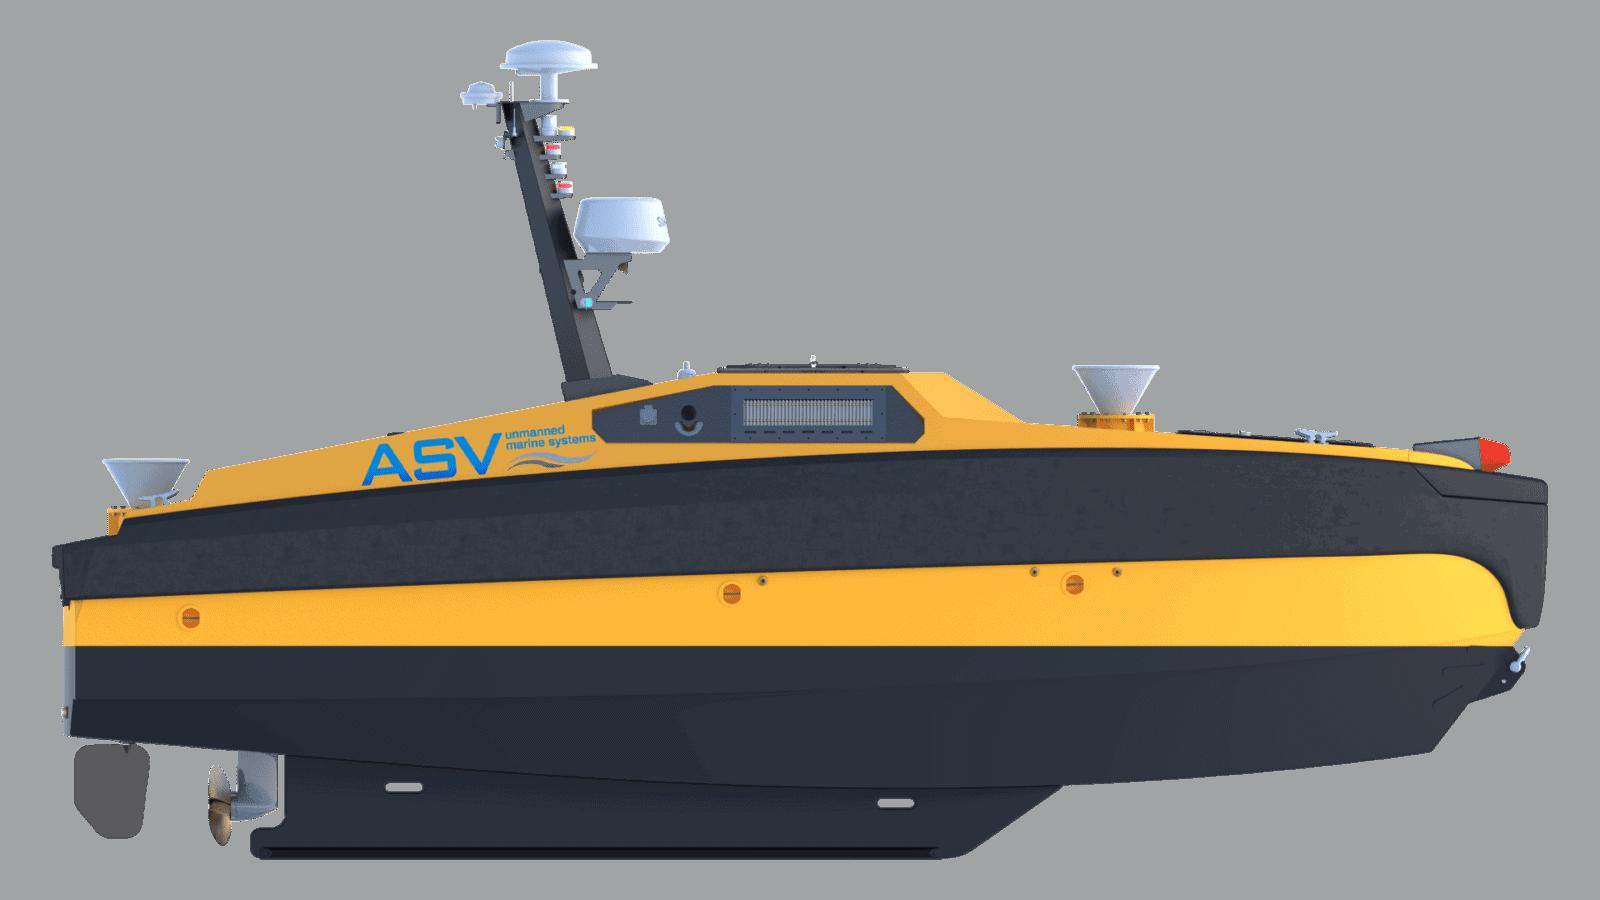 C-Worker 8 Multi-Role Offshore ASV